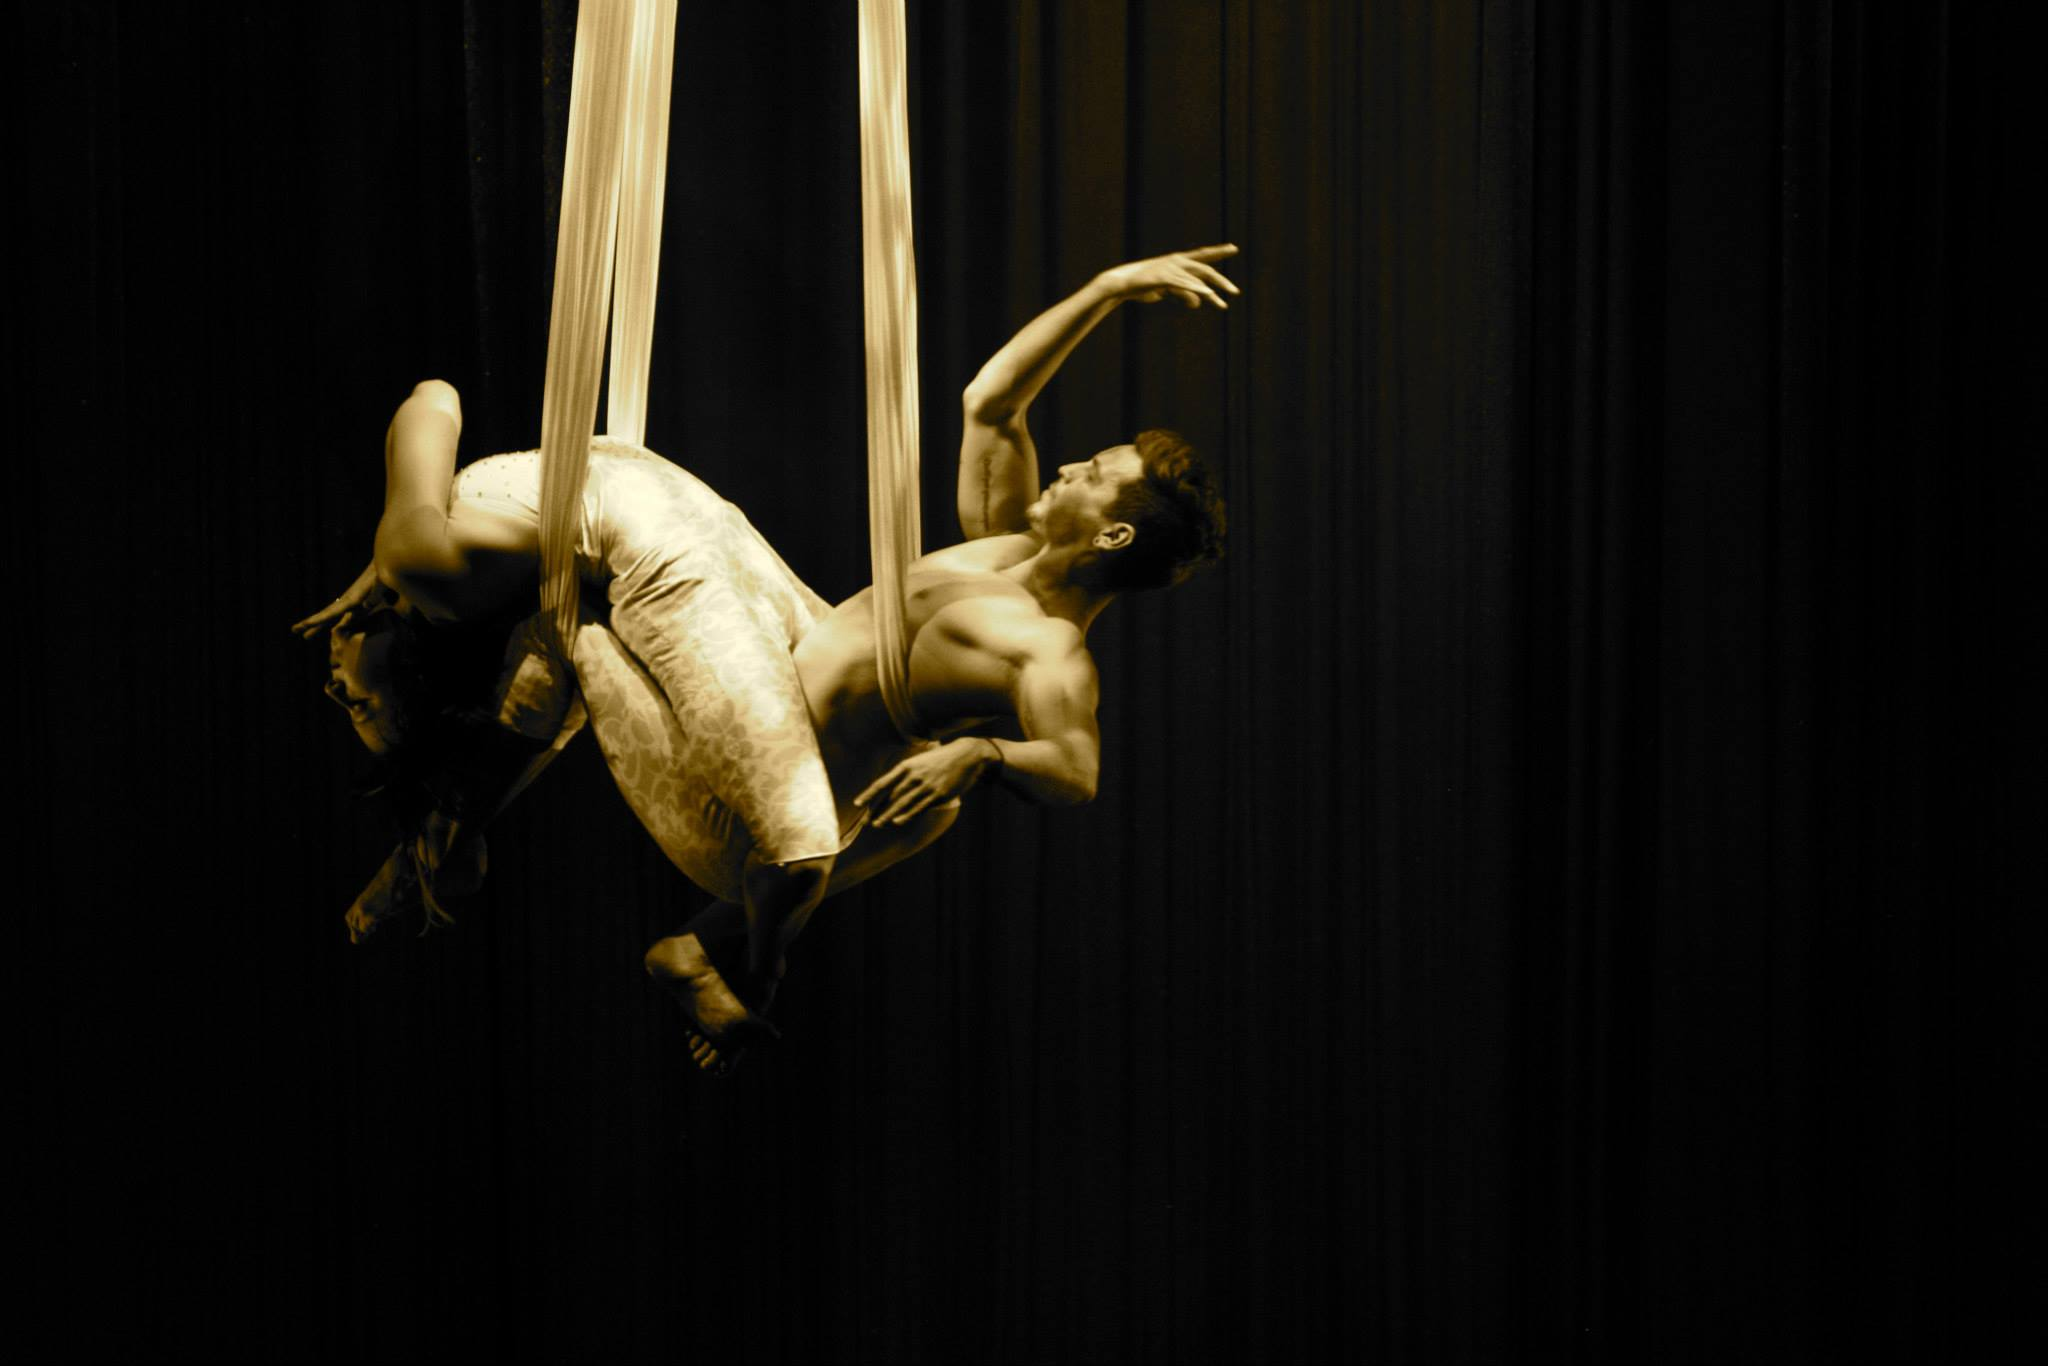 Duo Hammocks Performers Tina Phoenix and Fernando Miro